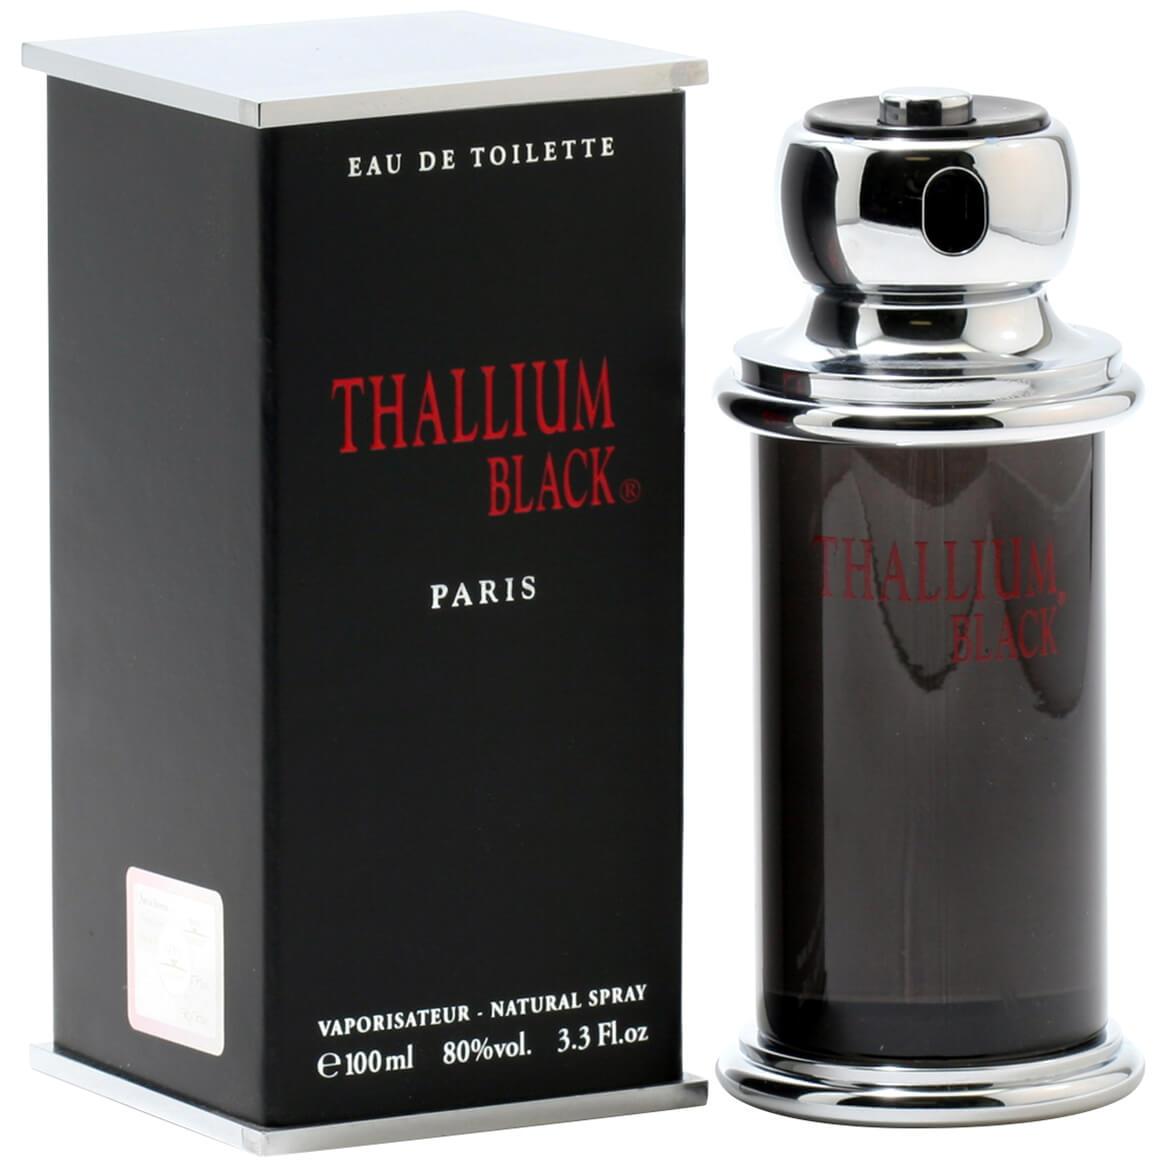 Jacques Evard Thallium Black for Men EDT, 3.3 oz.-366850